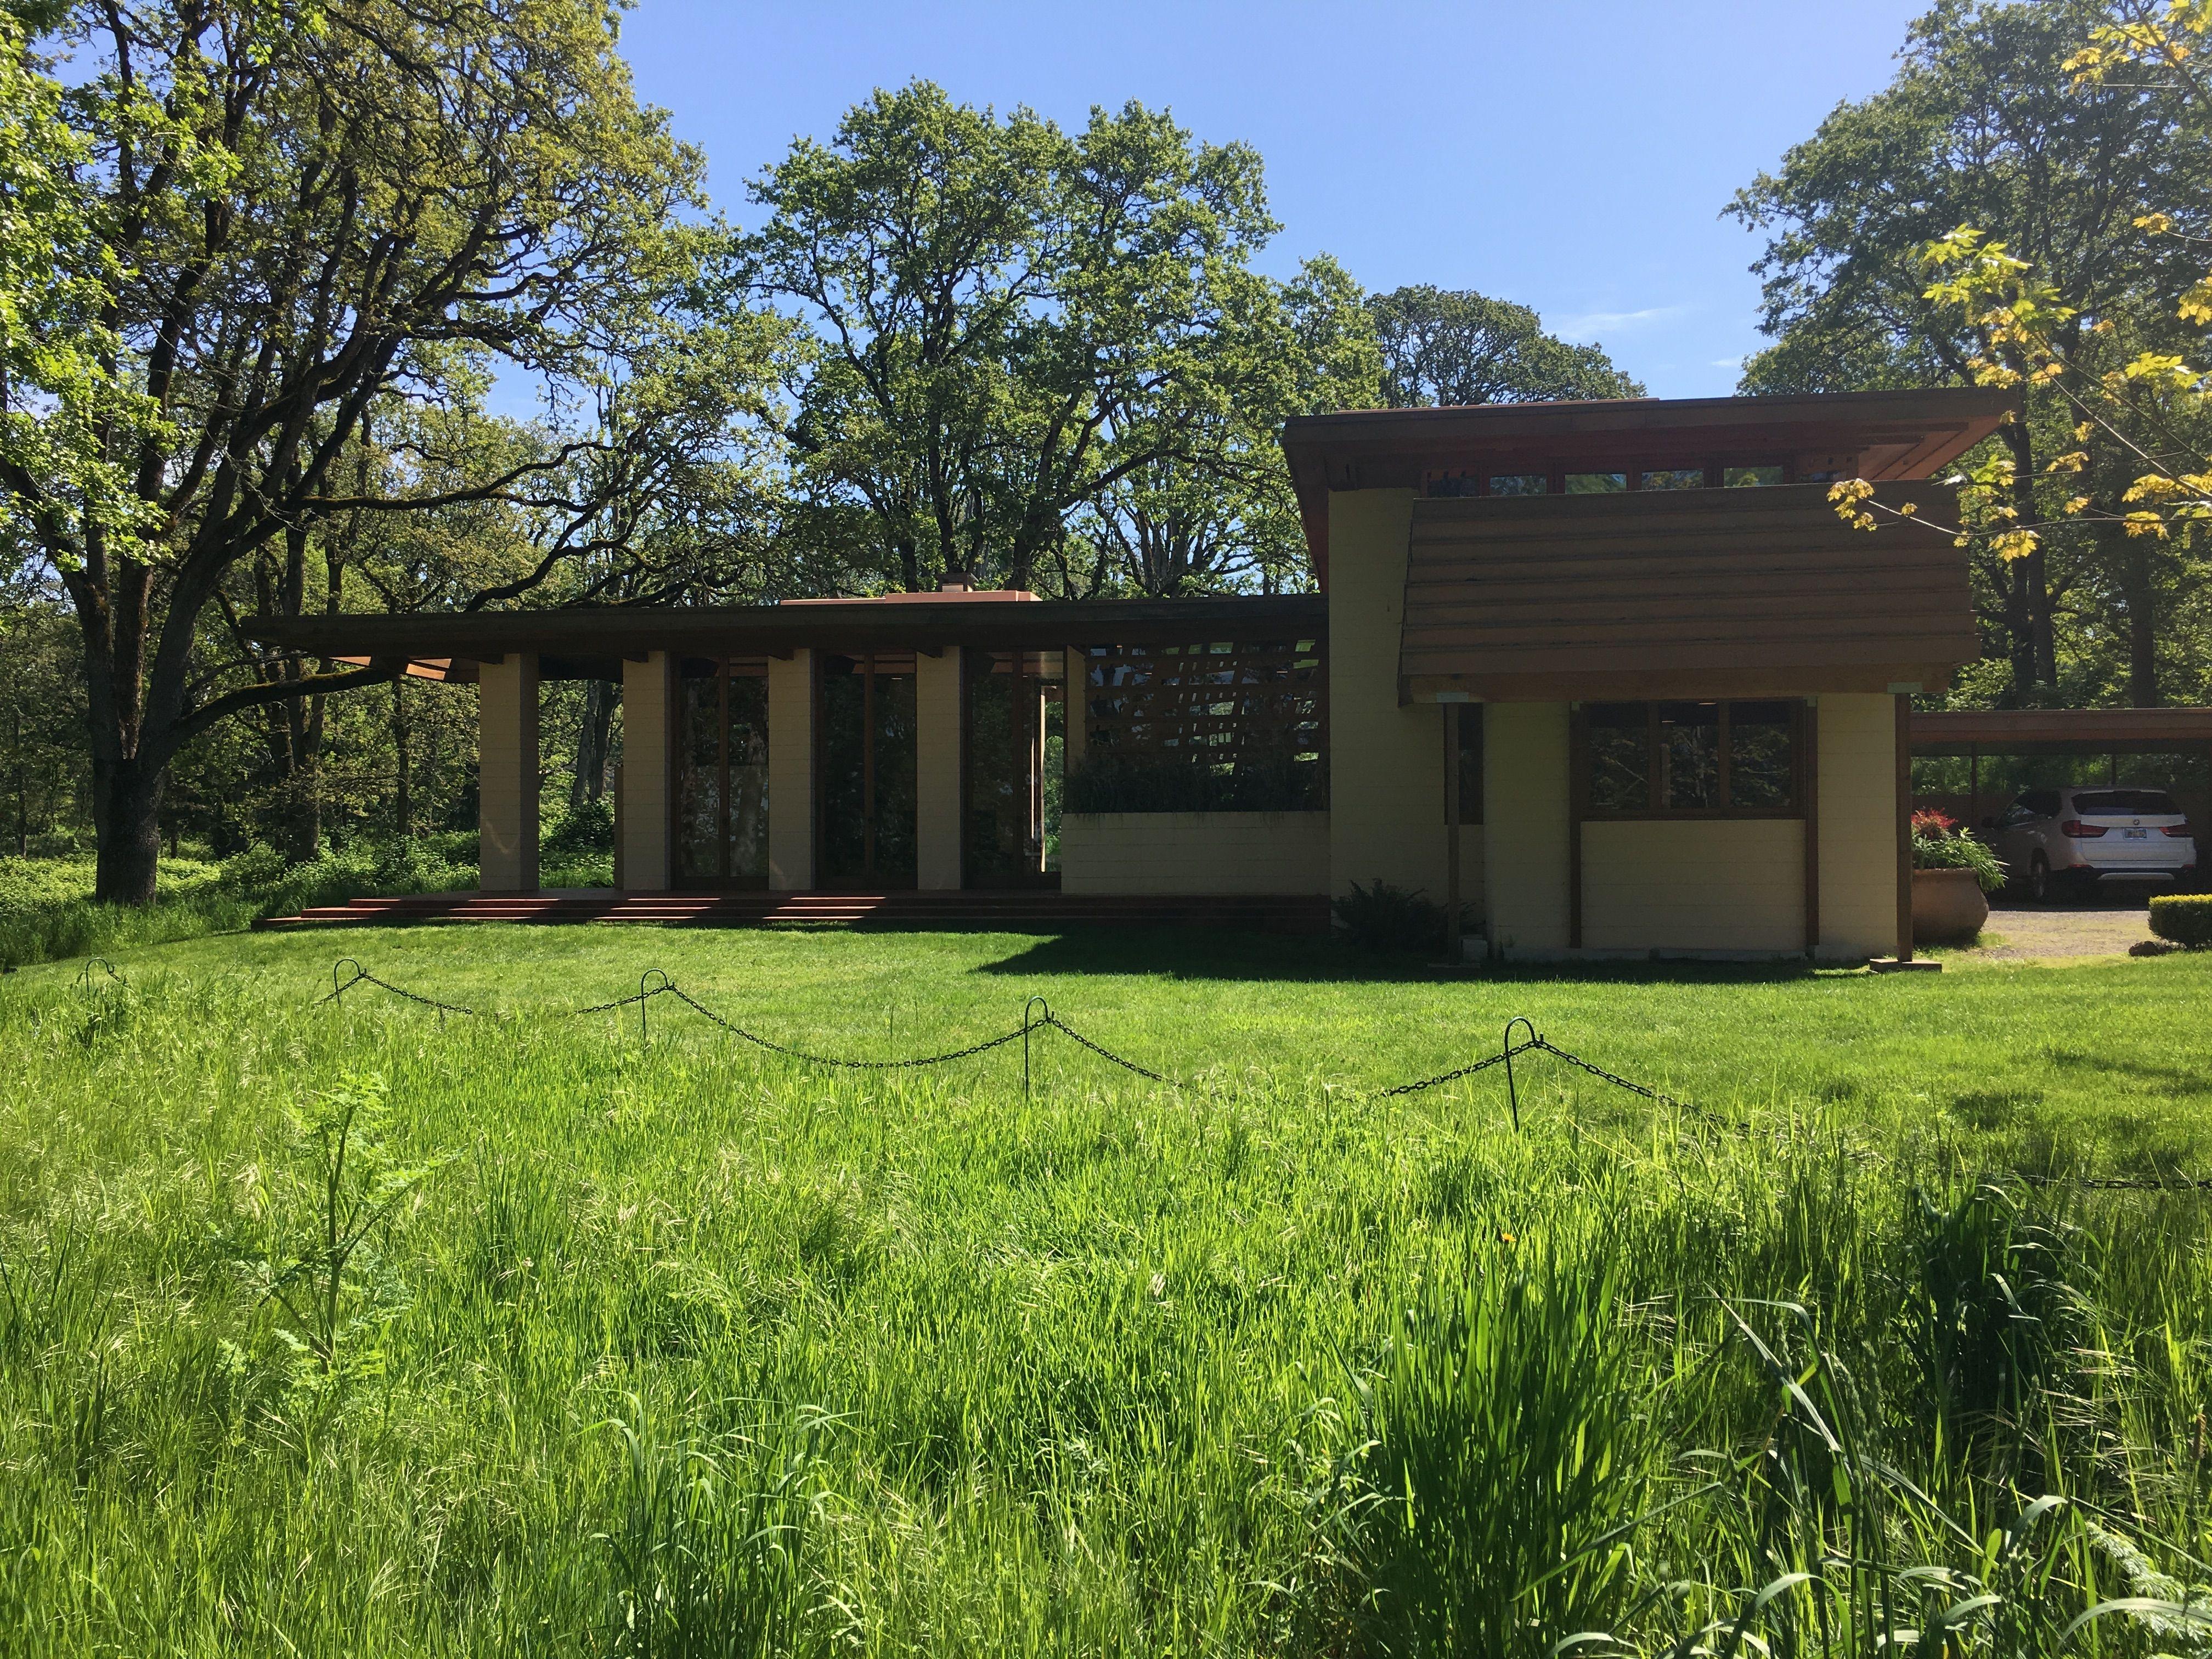 Conrad And Evelyn Gordon House 1957 63 Relocated To Silverton Oregon 2001 Usonian Style Frank Lloyd Wrigh Usonian Style Usonian Frank Lloyd Wright Usonian